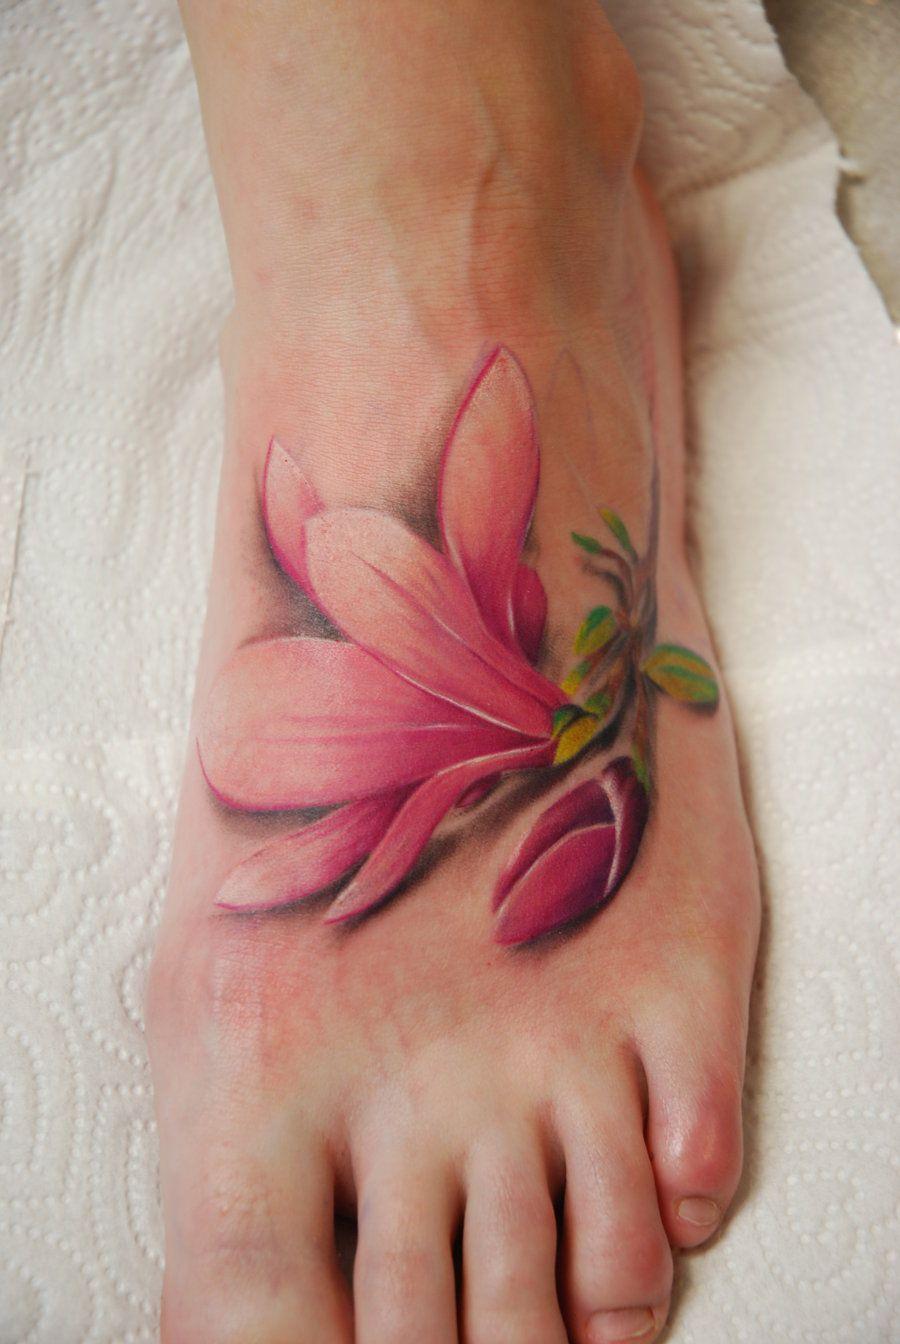 Pin By Katie Saechao On Tattoo Pinterest Tattoo Flower And Tatting